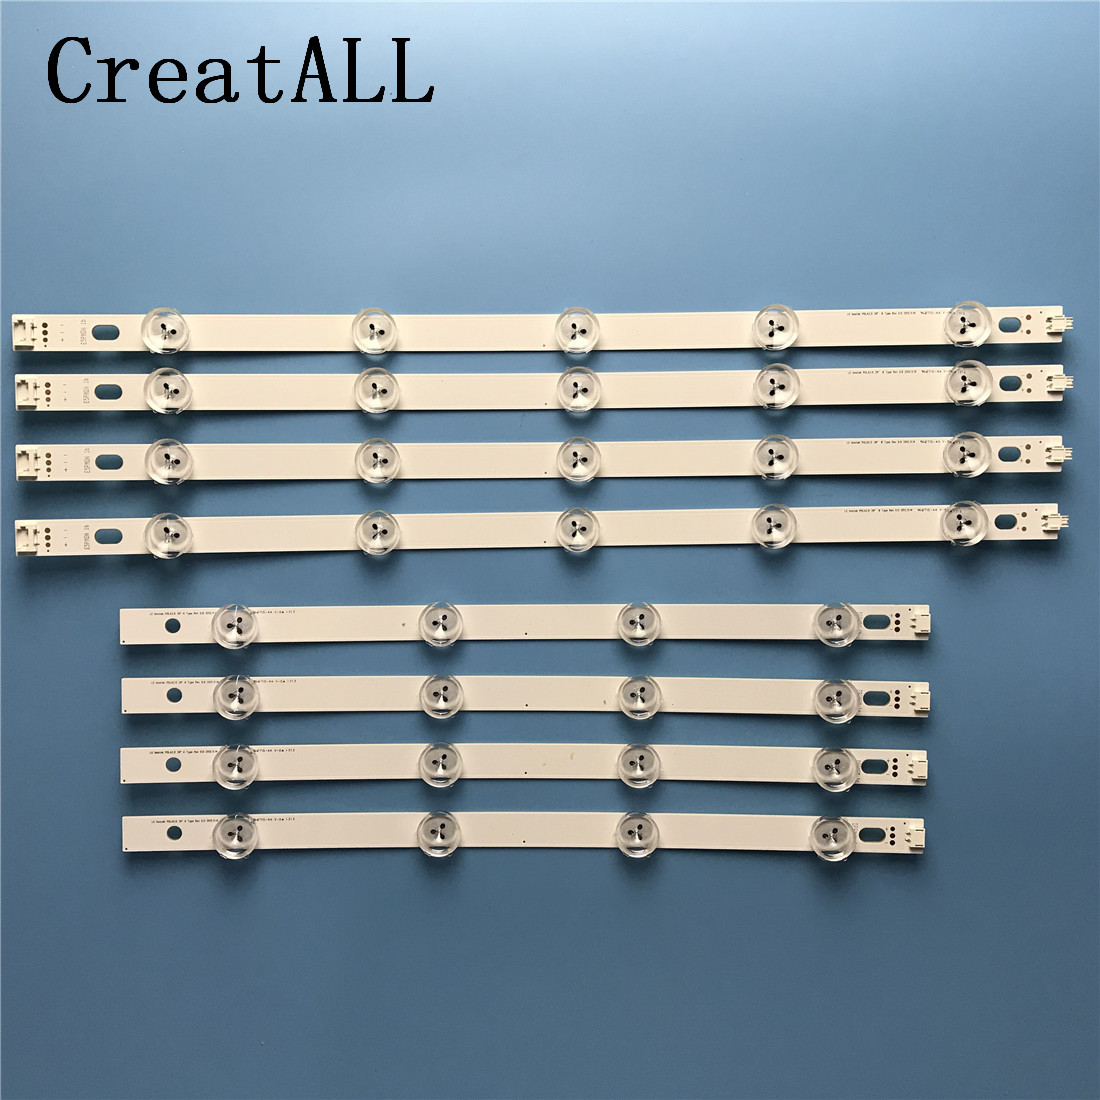 780mm 9 LED Oroginal Backlight strip For LG 39 TV LG 39LN5100 INNOTEK POLA2 0 39